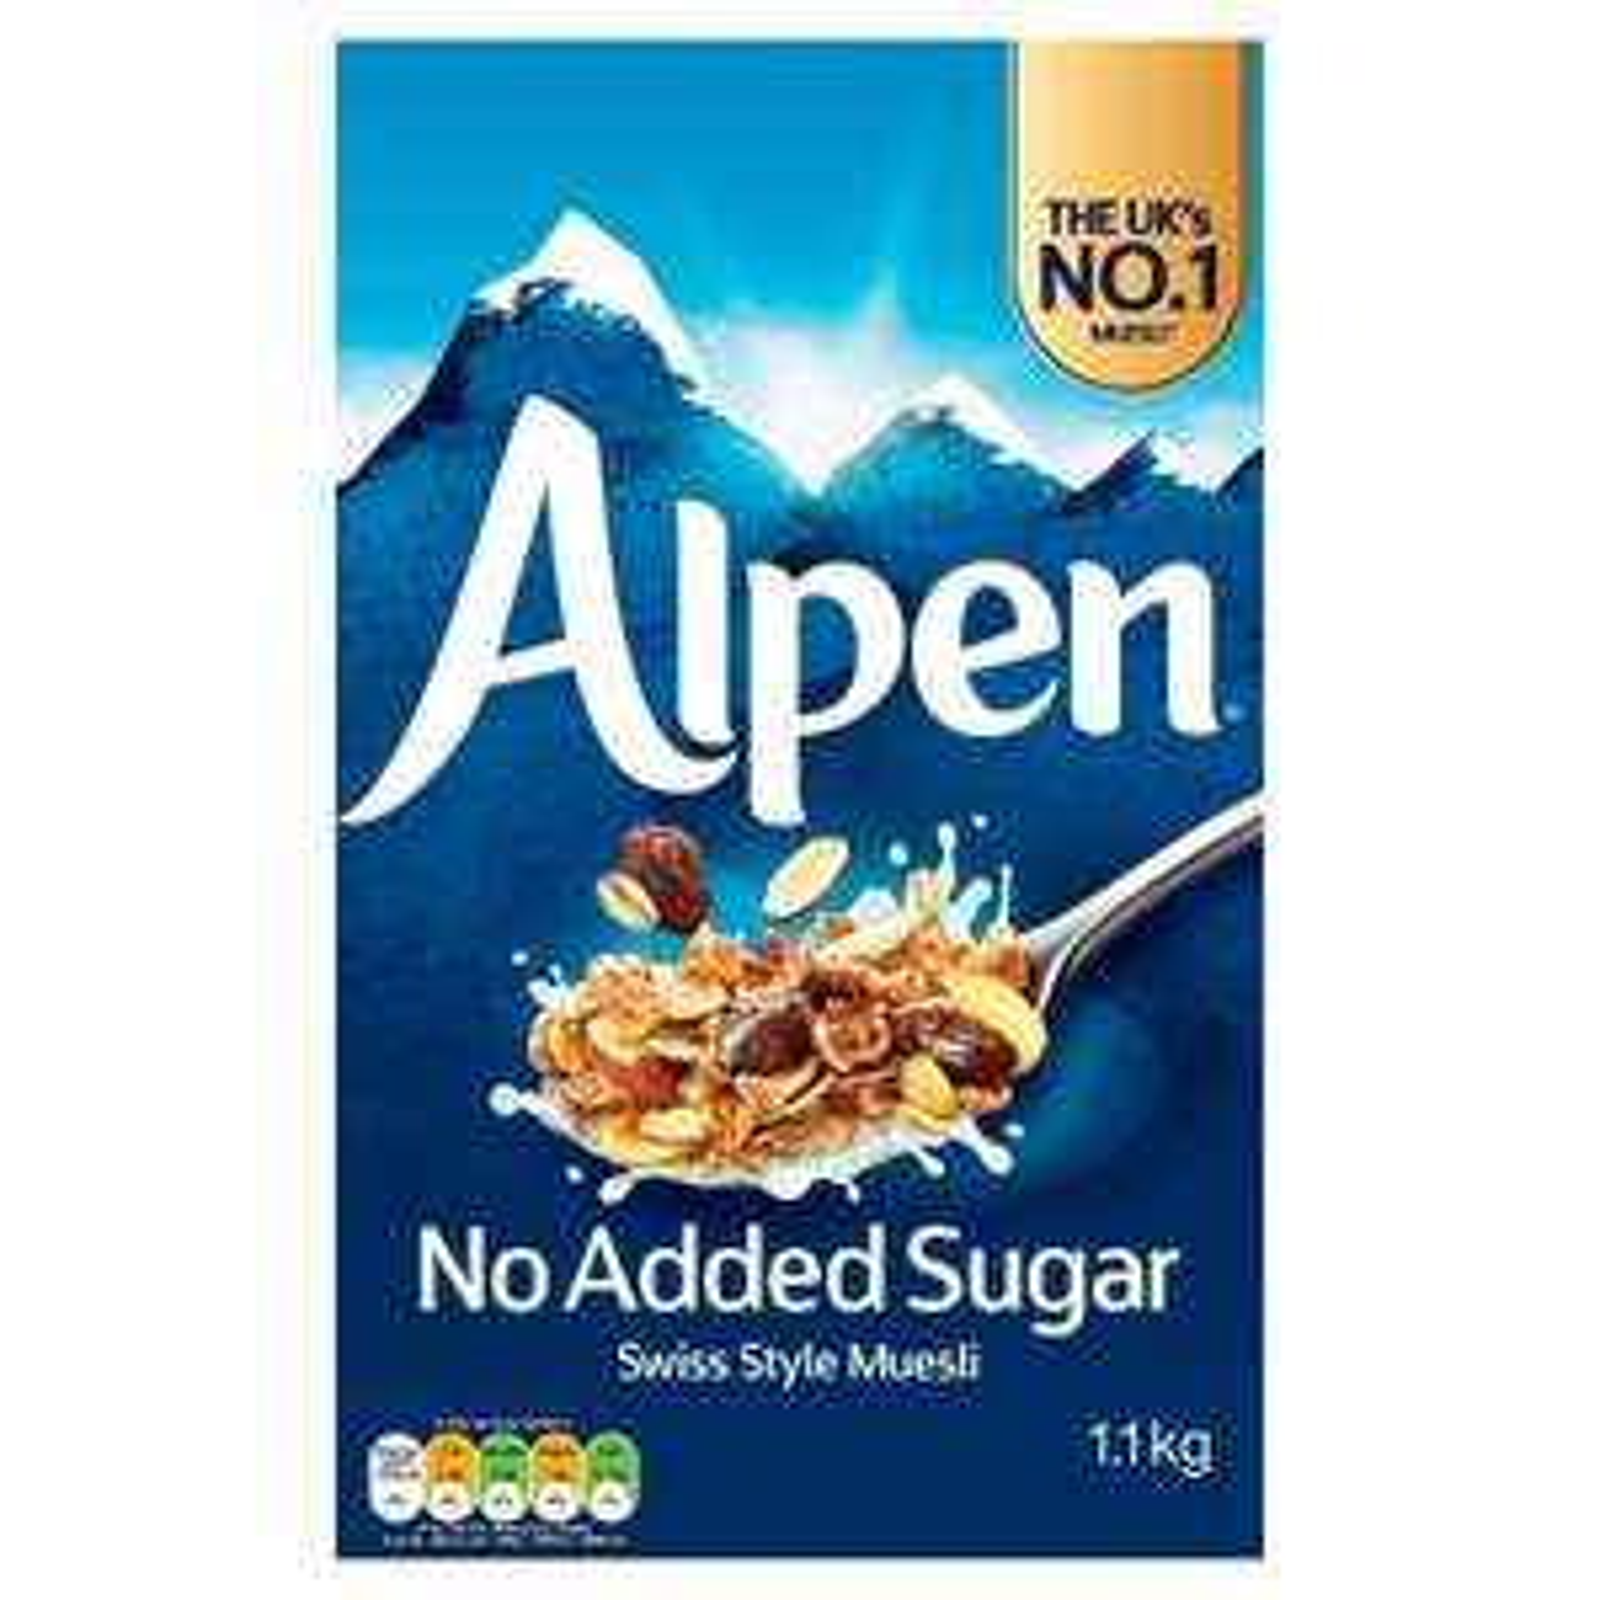 Alpen No Added Sugar Swiss Style Muesli 1.1kg £2.99 @ Iceland